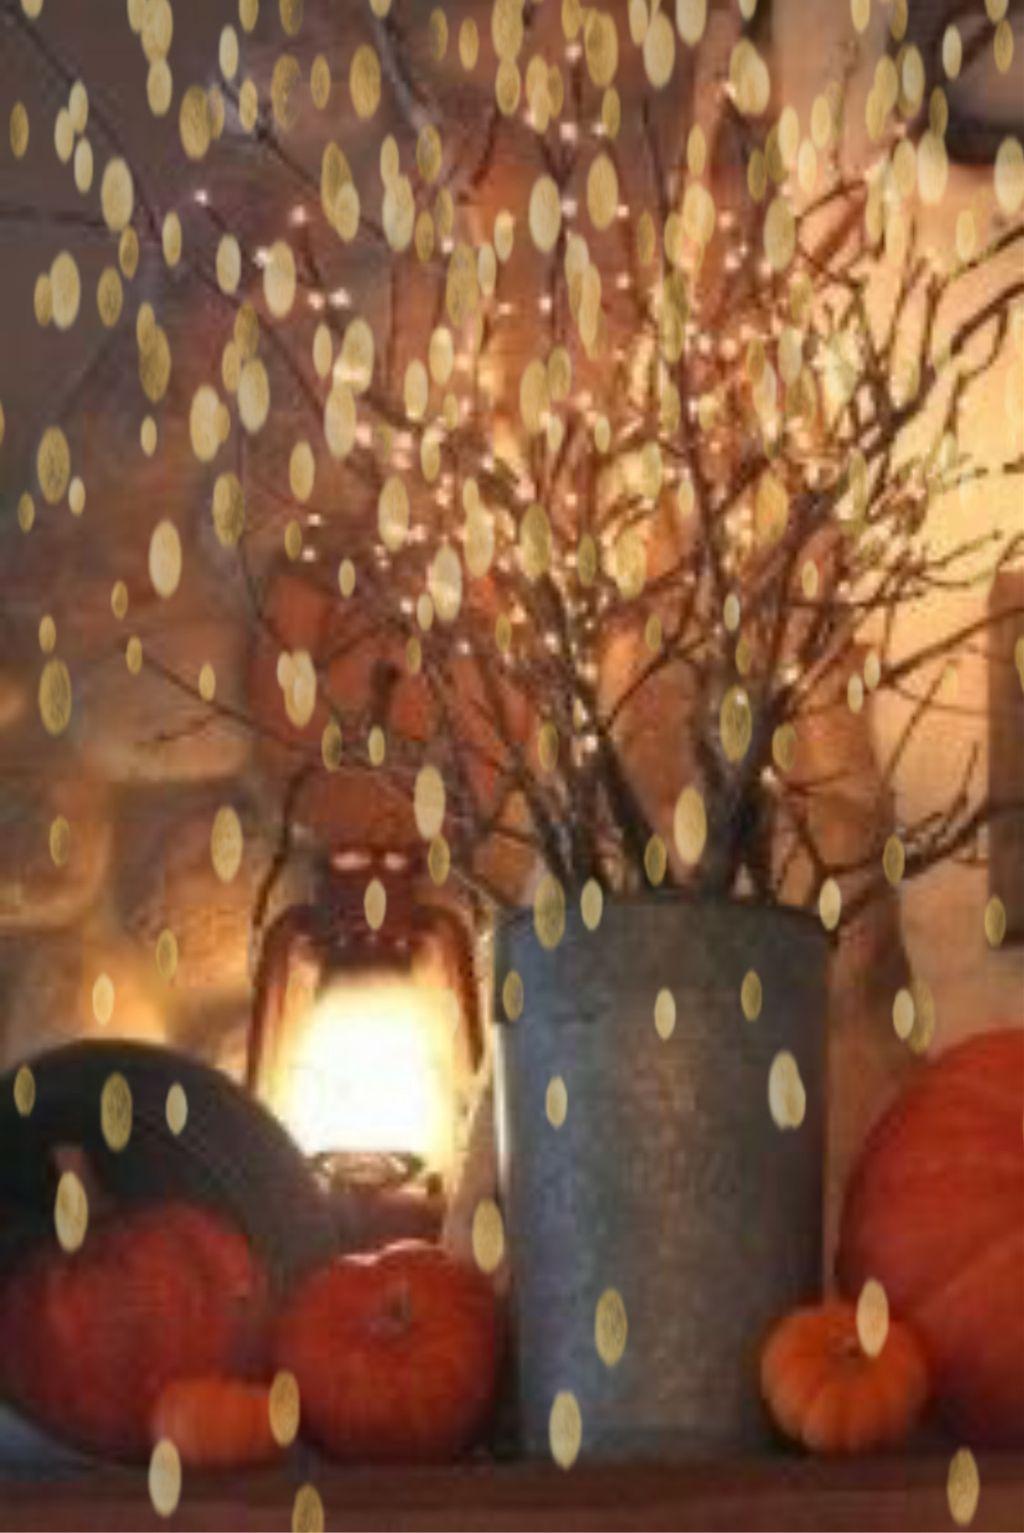 #freetoedit #leaves #pumpkins #fall #autumn #beautiful #lights #remixit